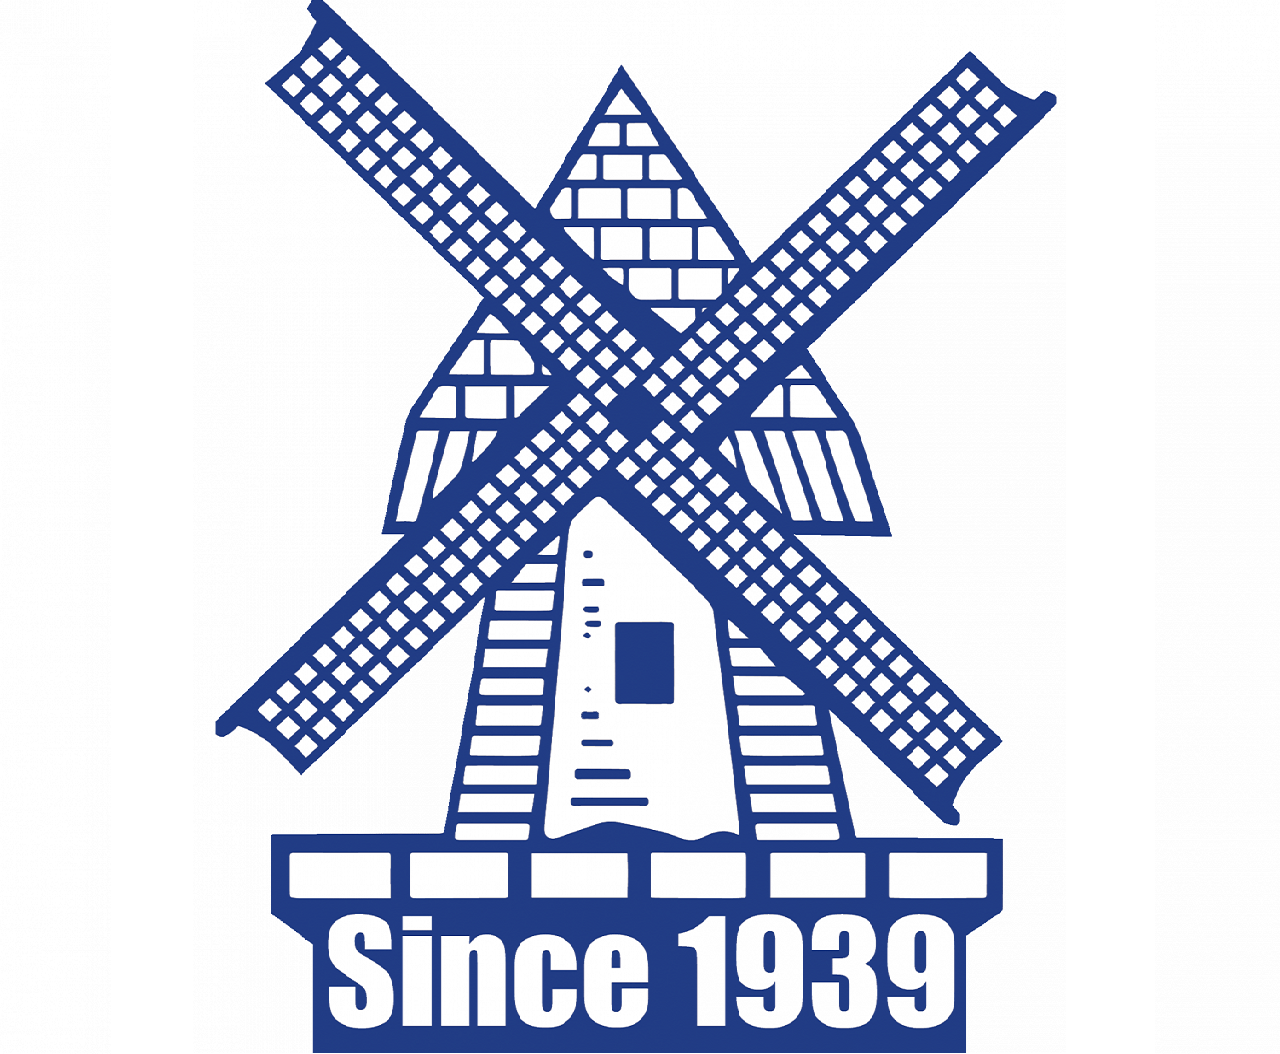 international maxxforce 13 oil filter base [ 1280 x 960 Pixel ]